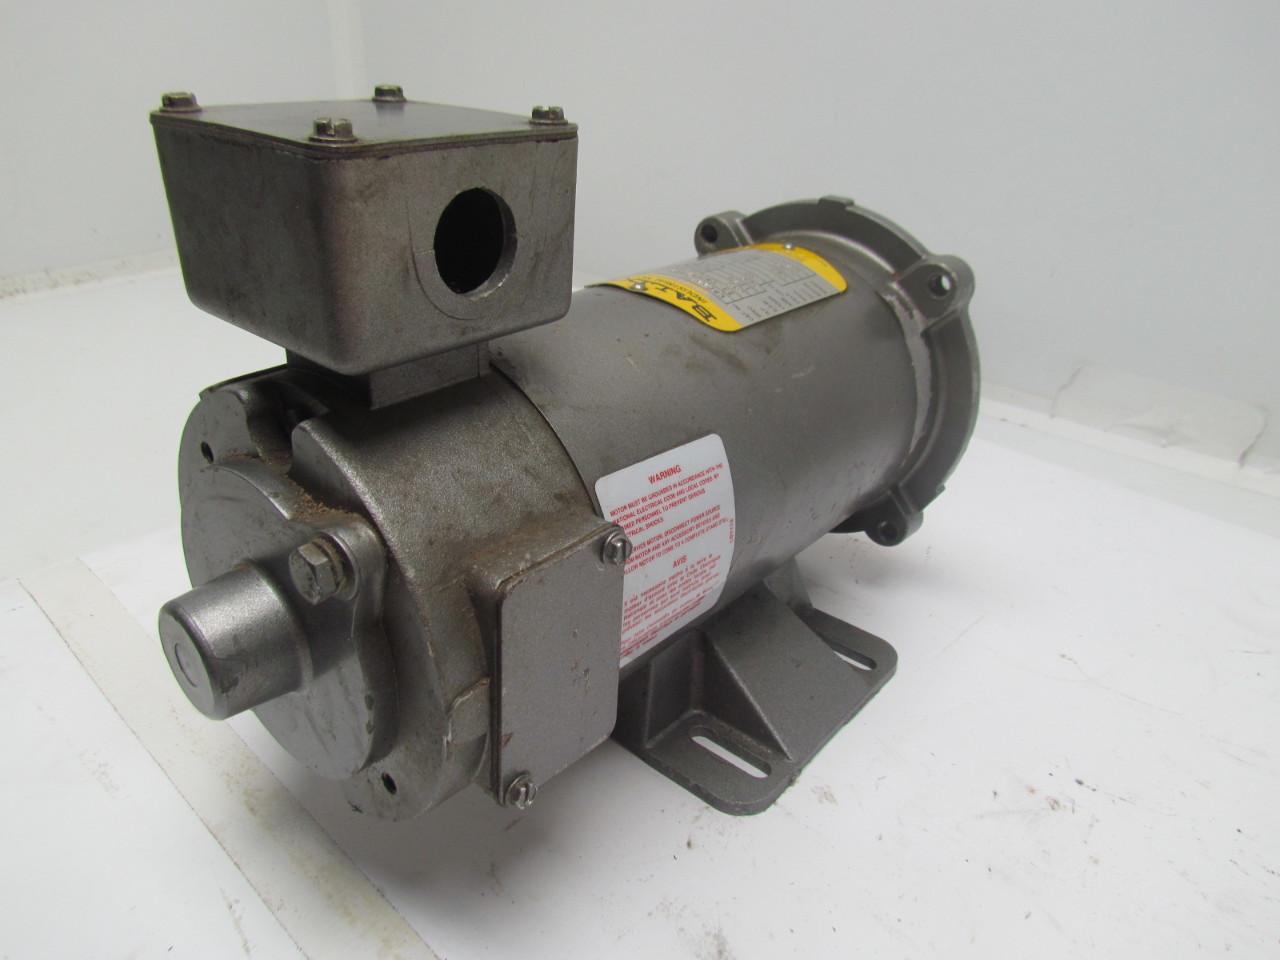 Baldor cdp3320 dc motor 33 2024z102 33hp 1750rpm 56c for 56c frame motor dimensions